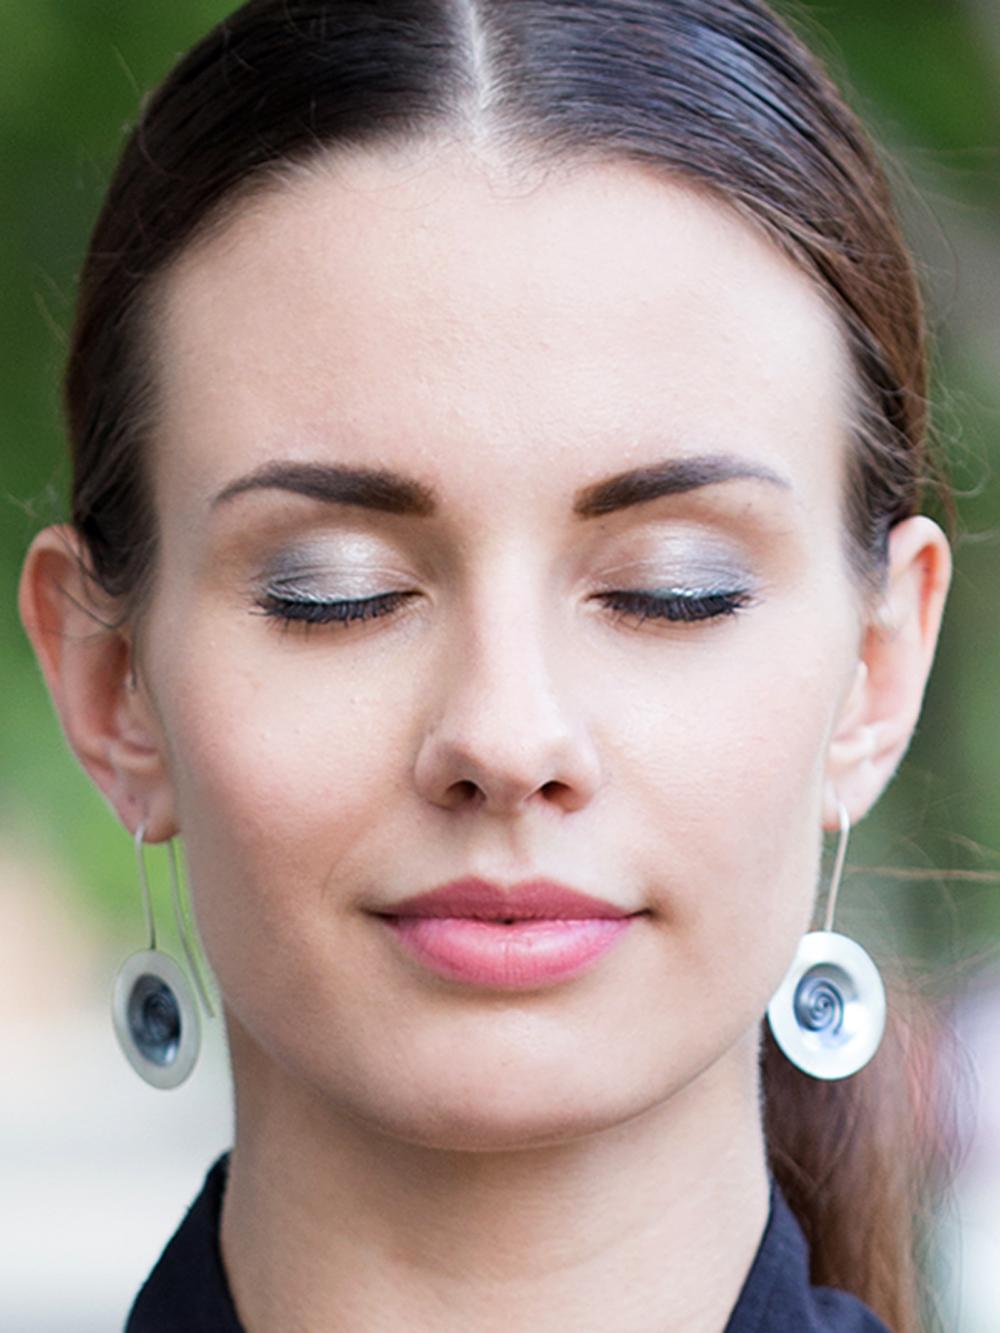 Spiral Eclipse Earrings